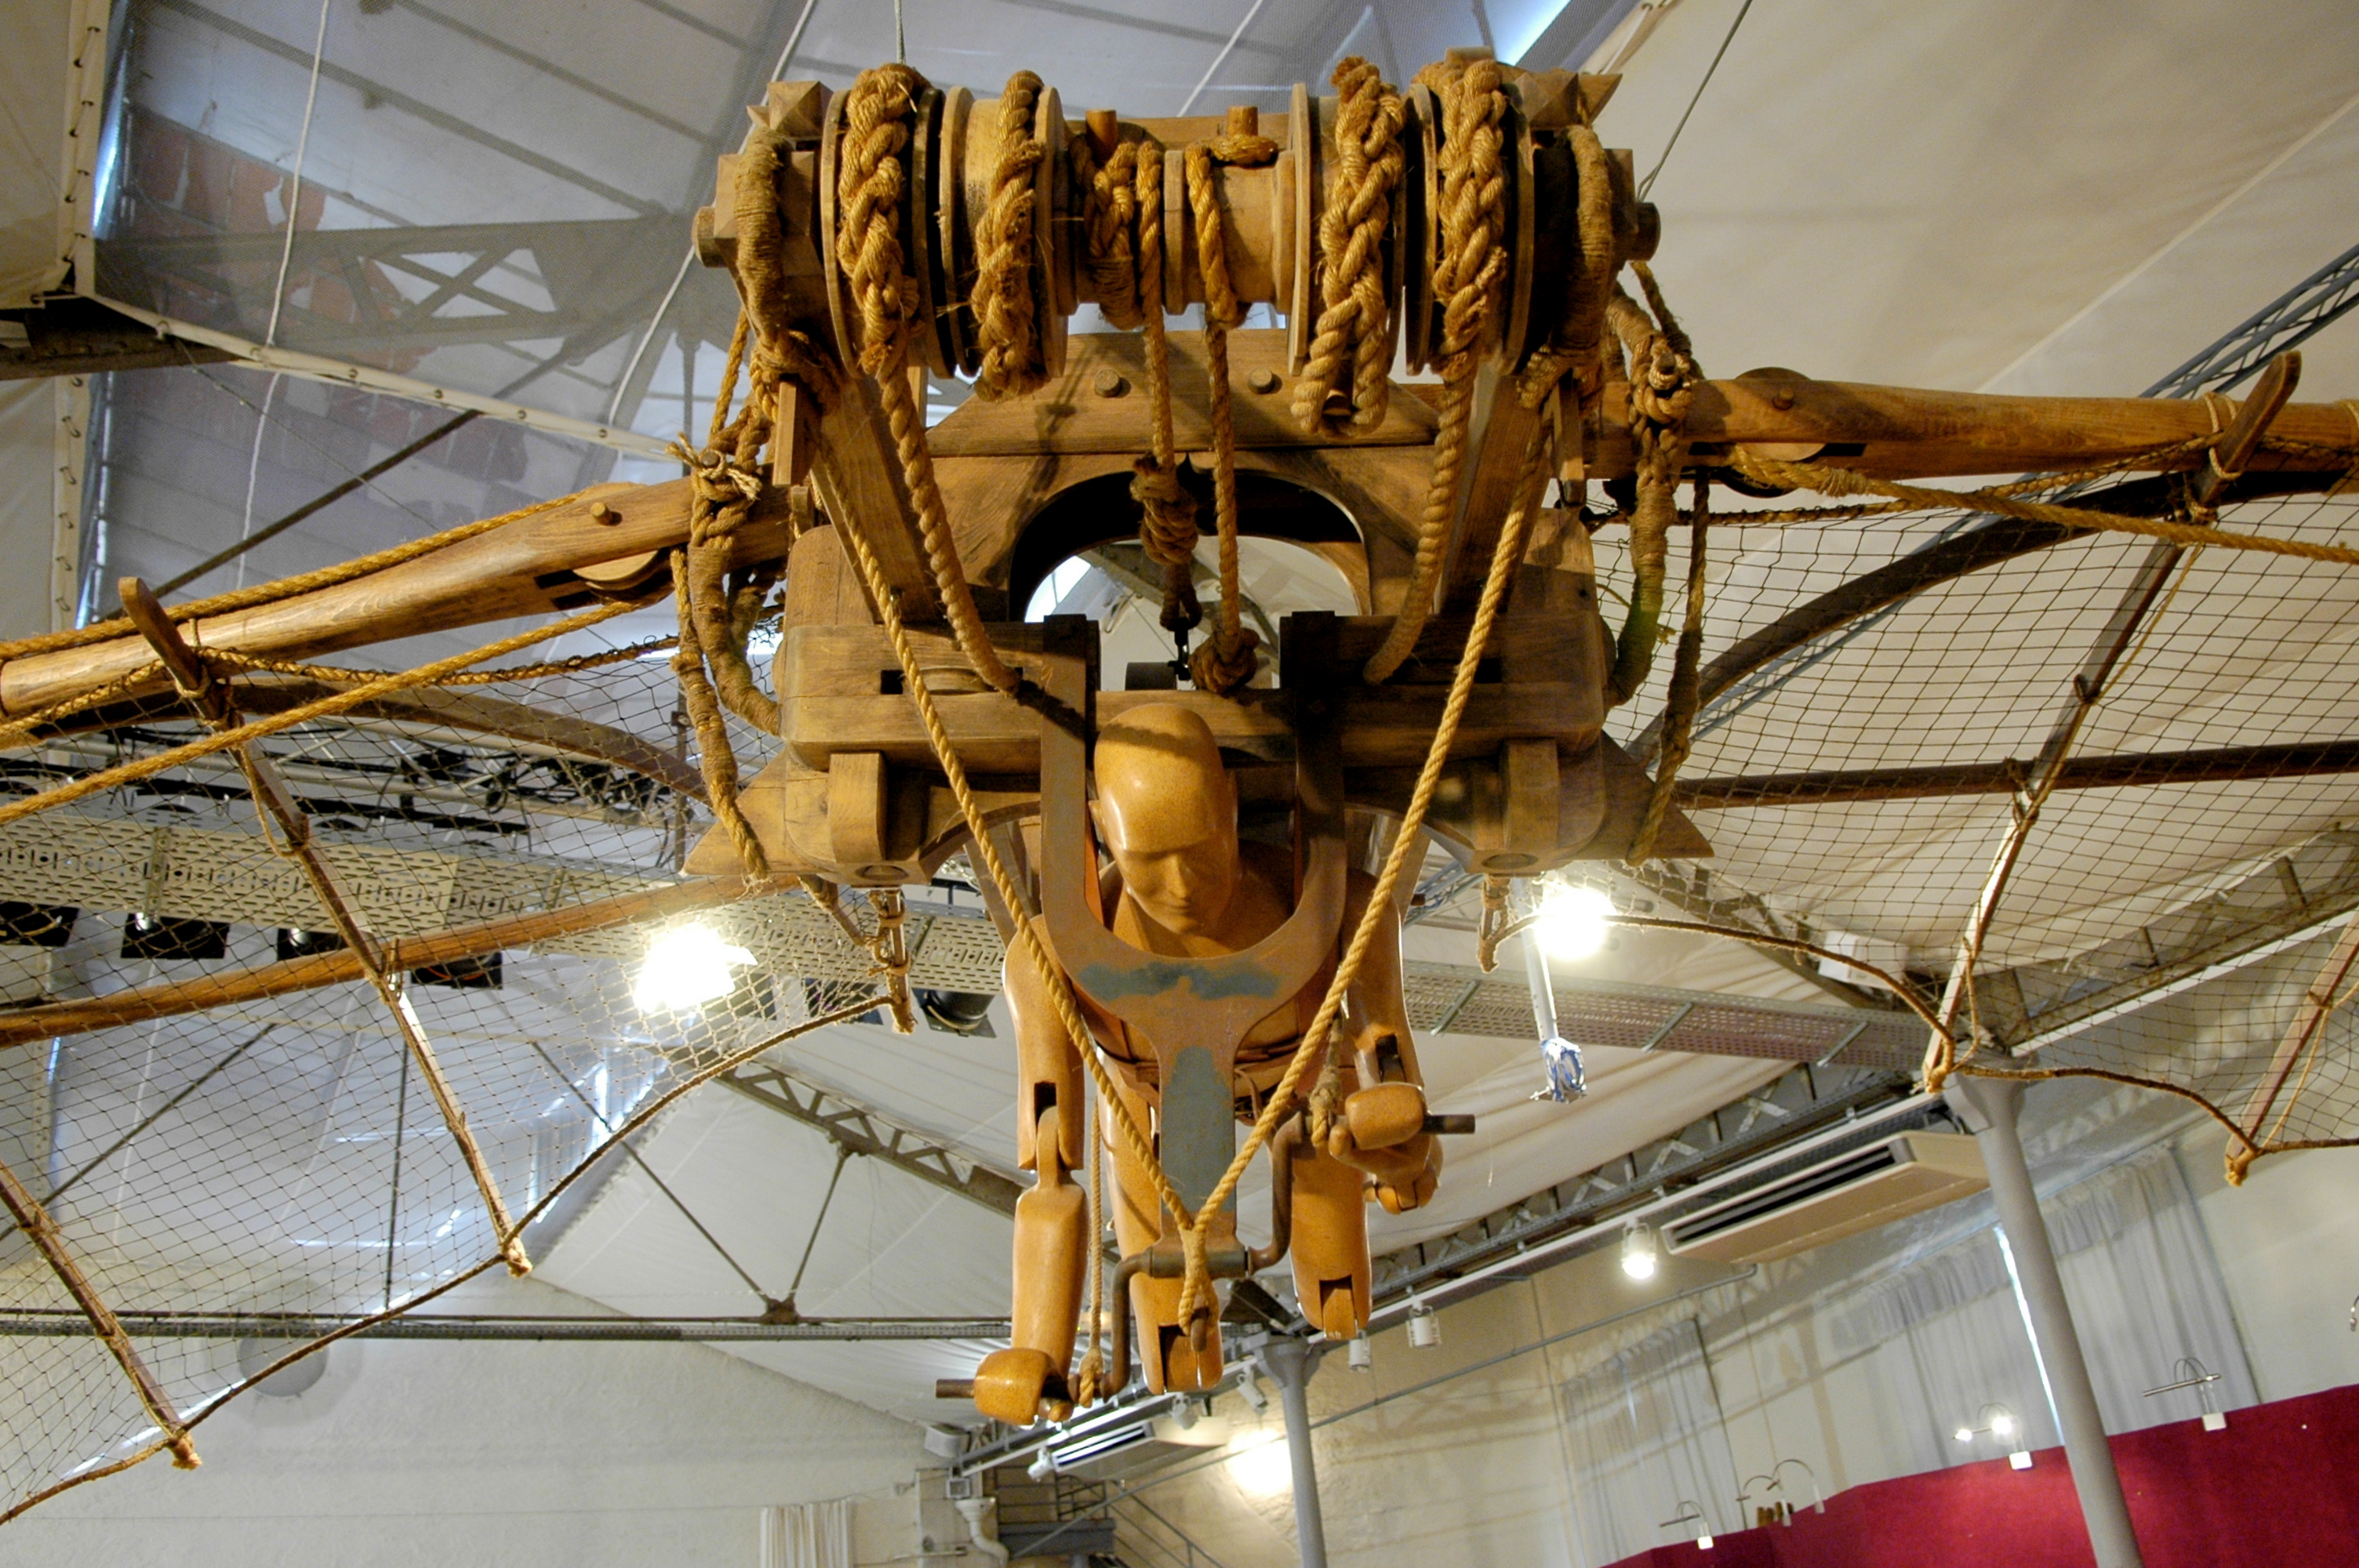 Model of Leonardo's airplane at Château du Clos Lucé